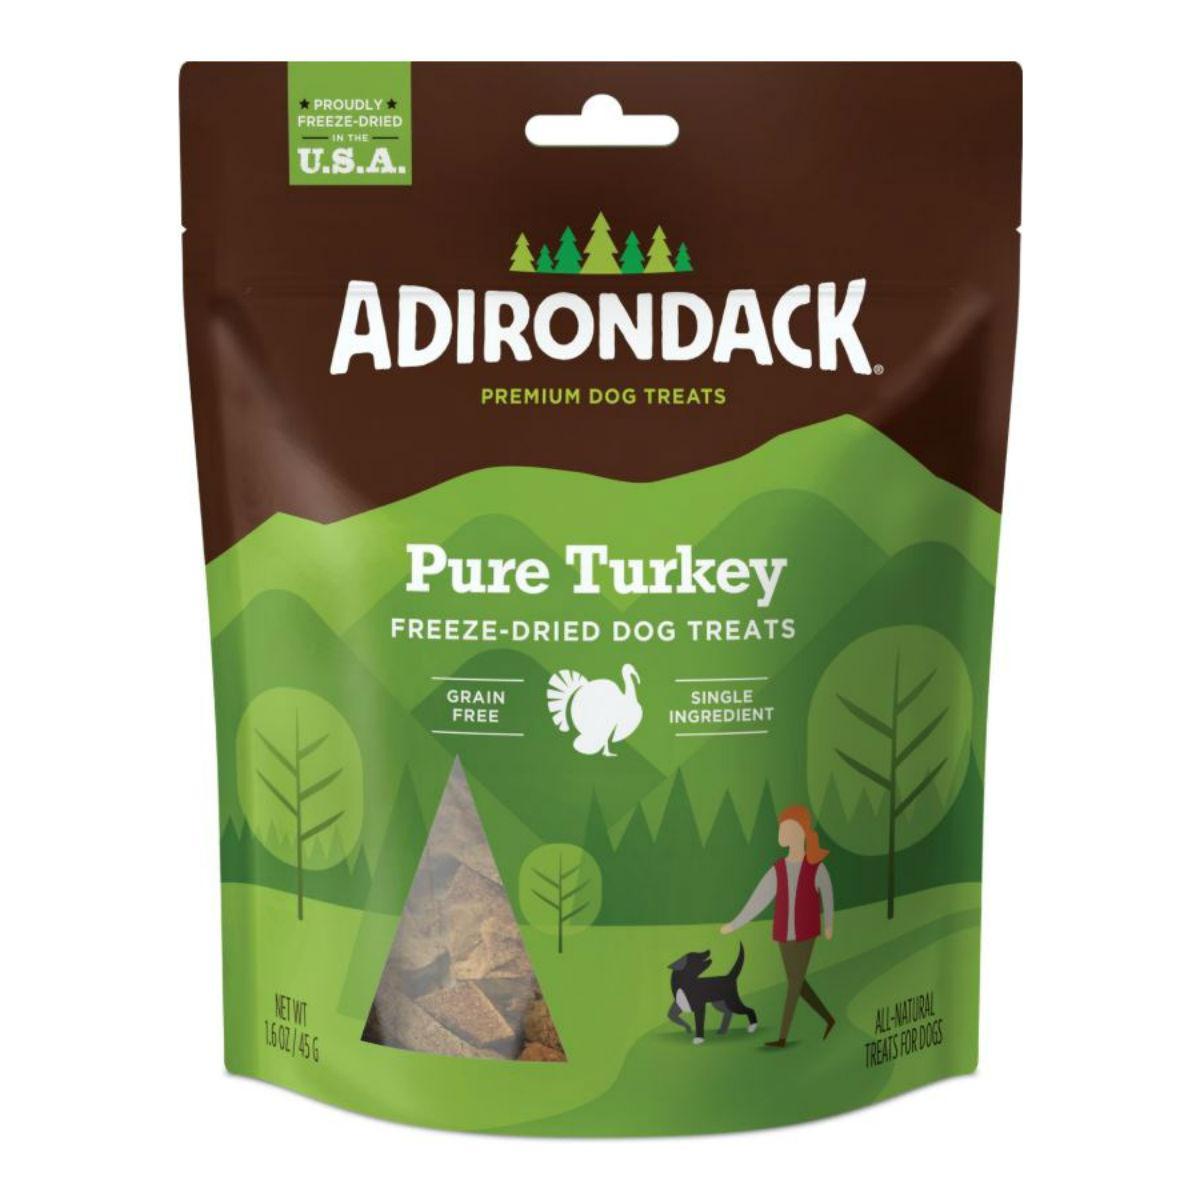 Adirondack Freeze-Dried Grain-Free Dog Treats - Pure Turkey Breast